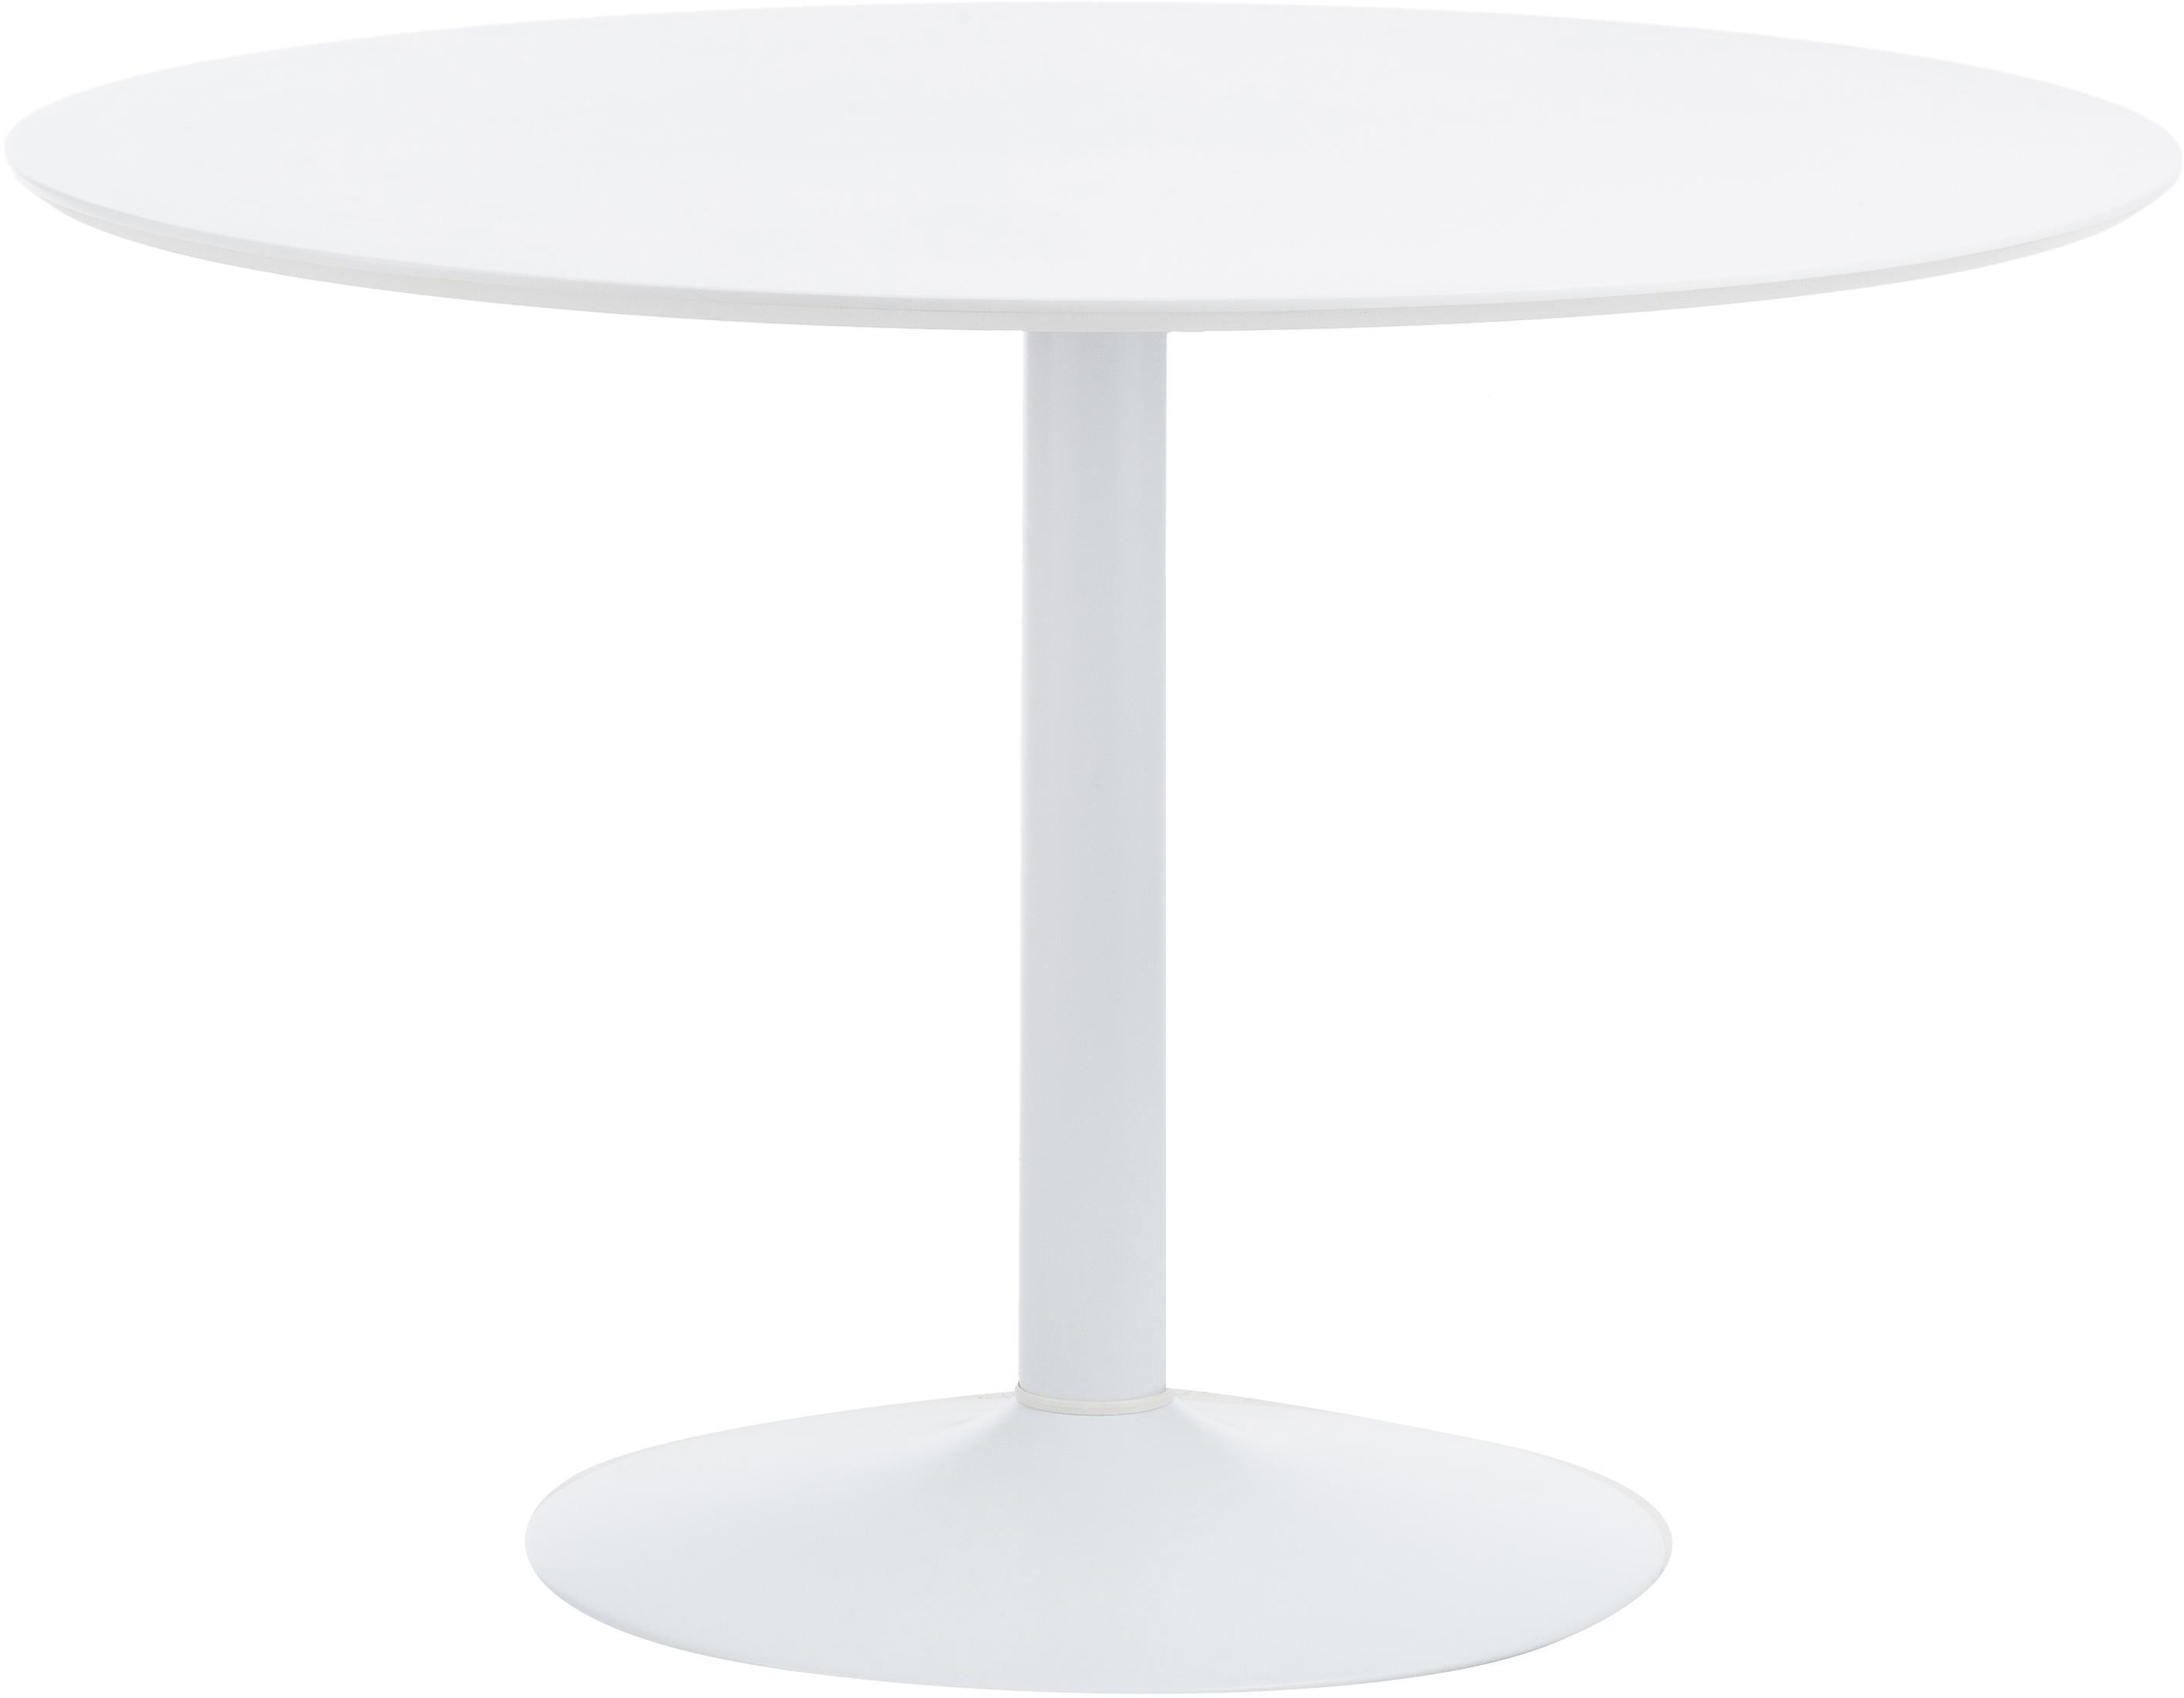 Mesa de comedor Mallorca, Tablero: tablero de fibras de dens, Blanco, Ø 110 cm